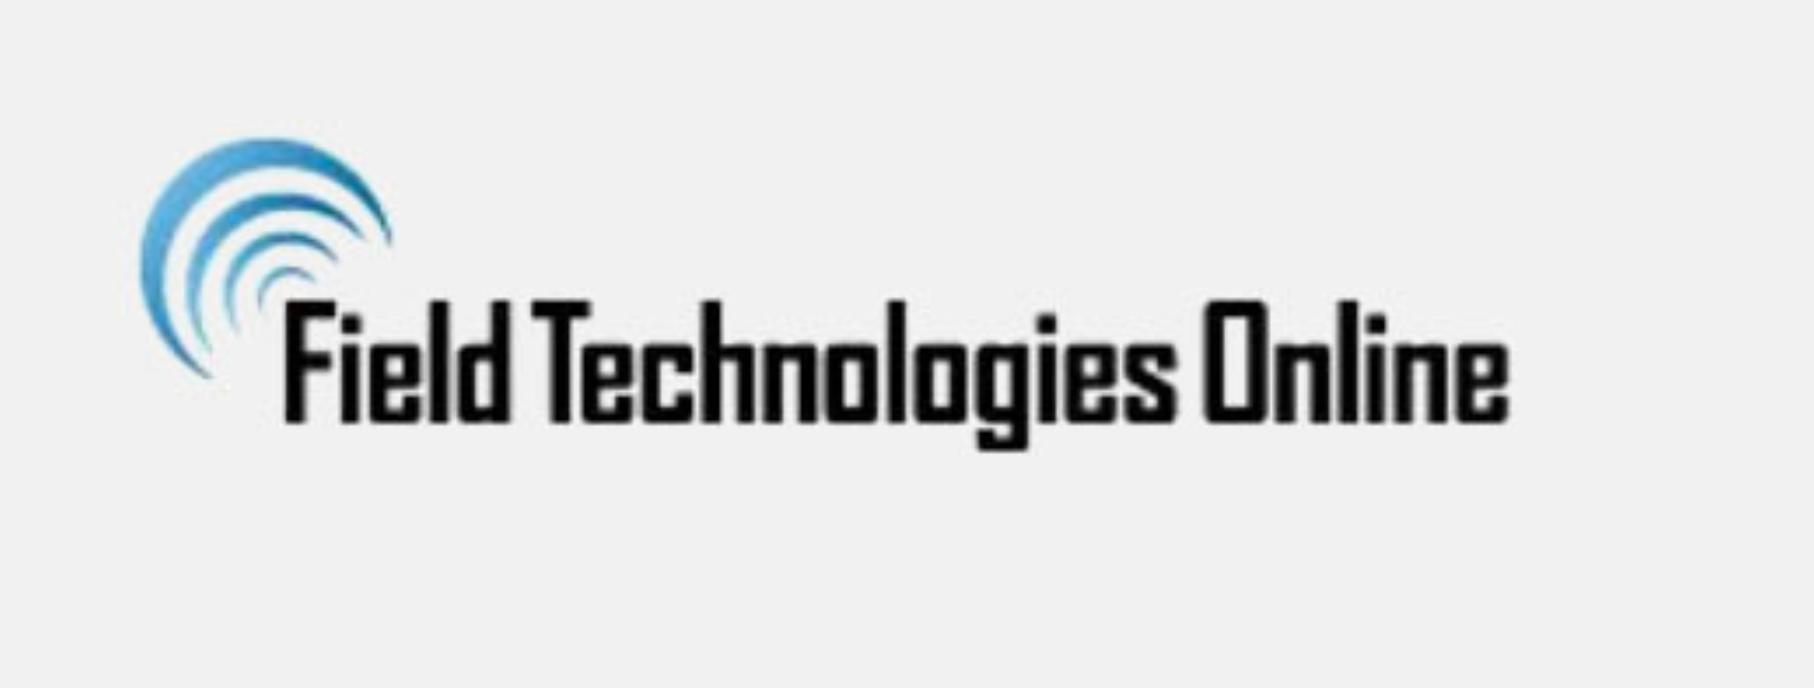 Field Technologies Online: Skyllful Now Part Of Honeywell's Independent Software Vendor Partner Program